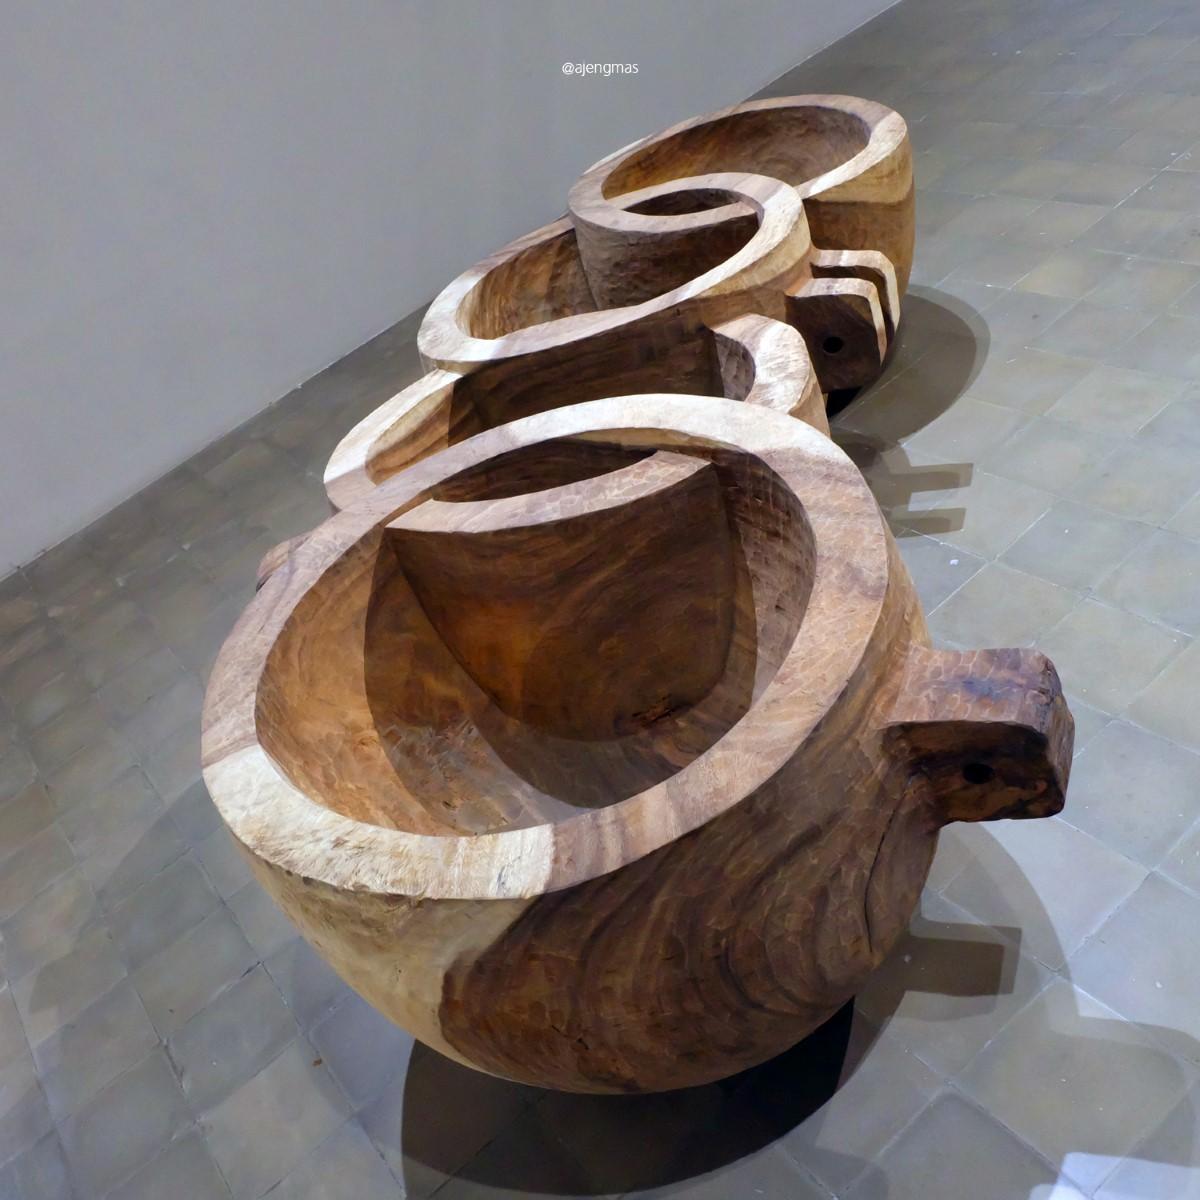 artjog9-artjog-karya-seni-jogja-ajengmas